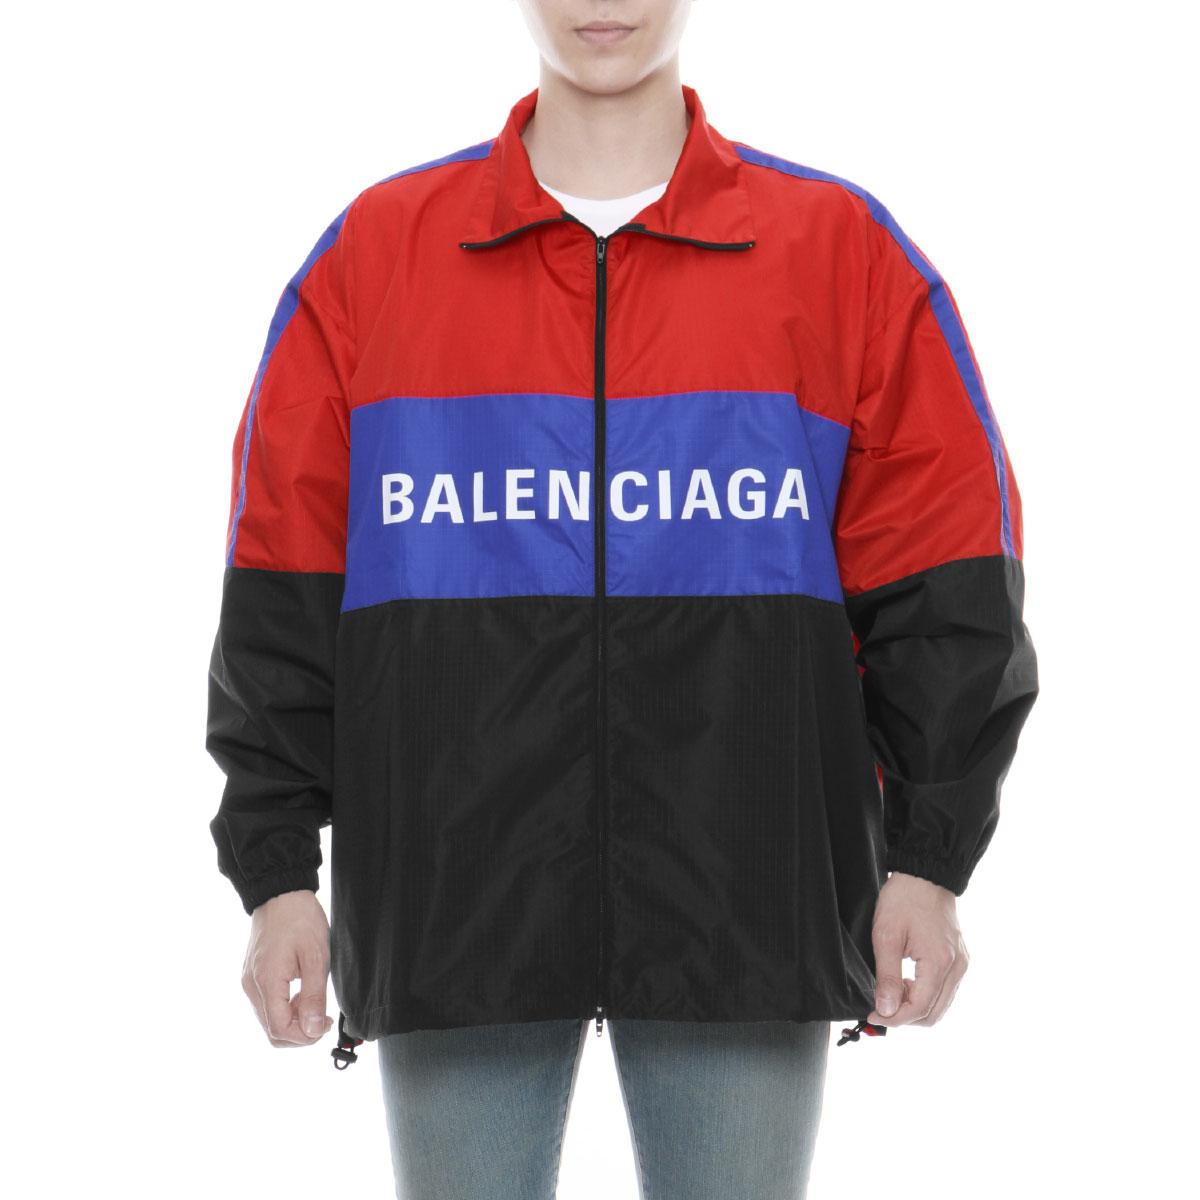 les ventes chaudes ca502 f499a 534317 バレンシアガ BALENCIAGA outer men TYD33 6210 jacket ROUGE/NOIR multicolored